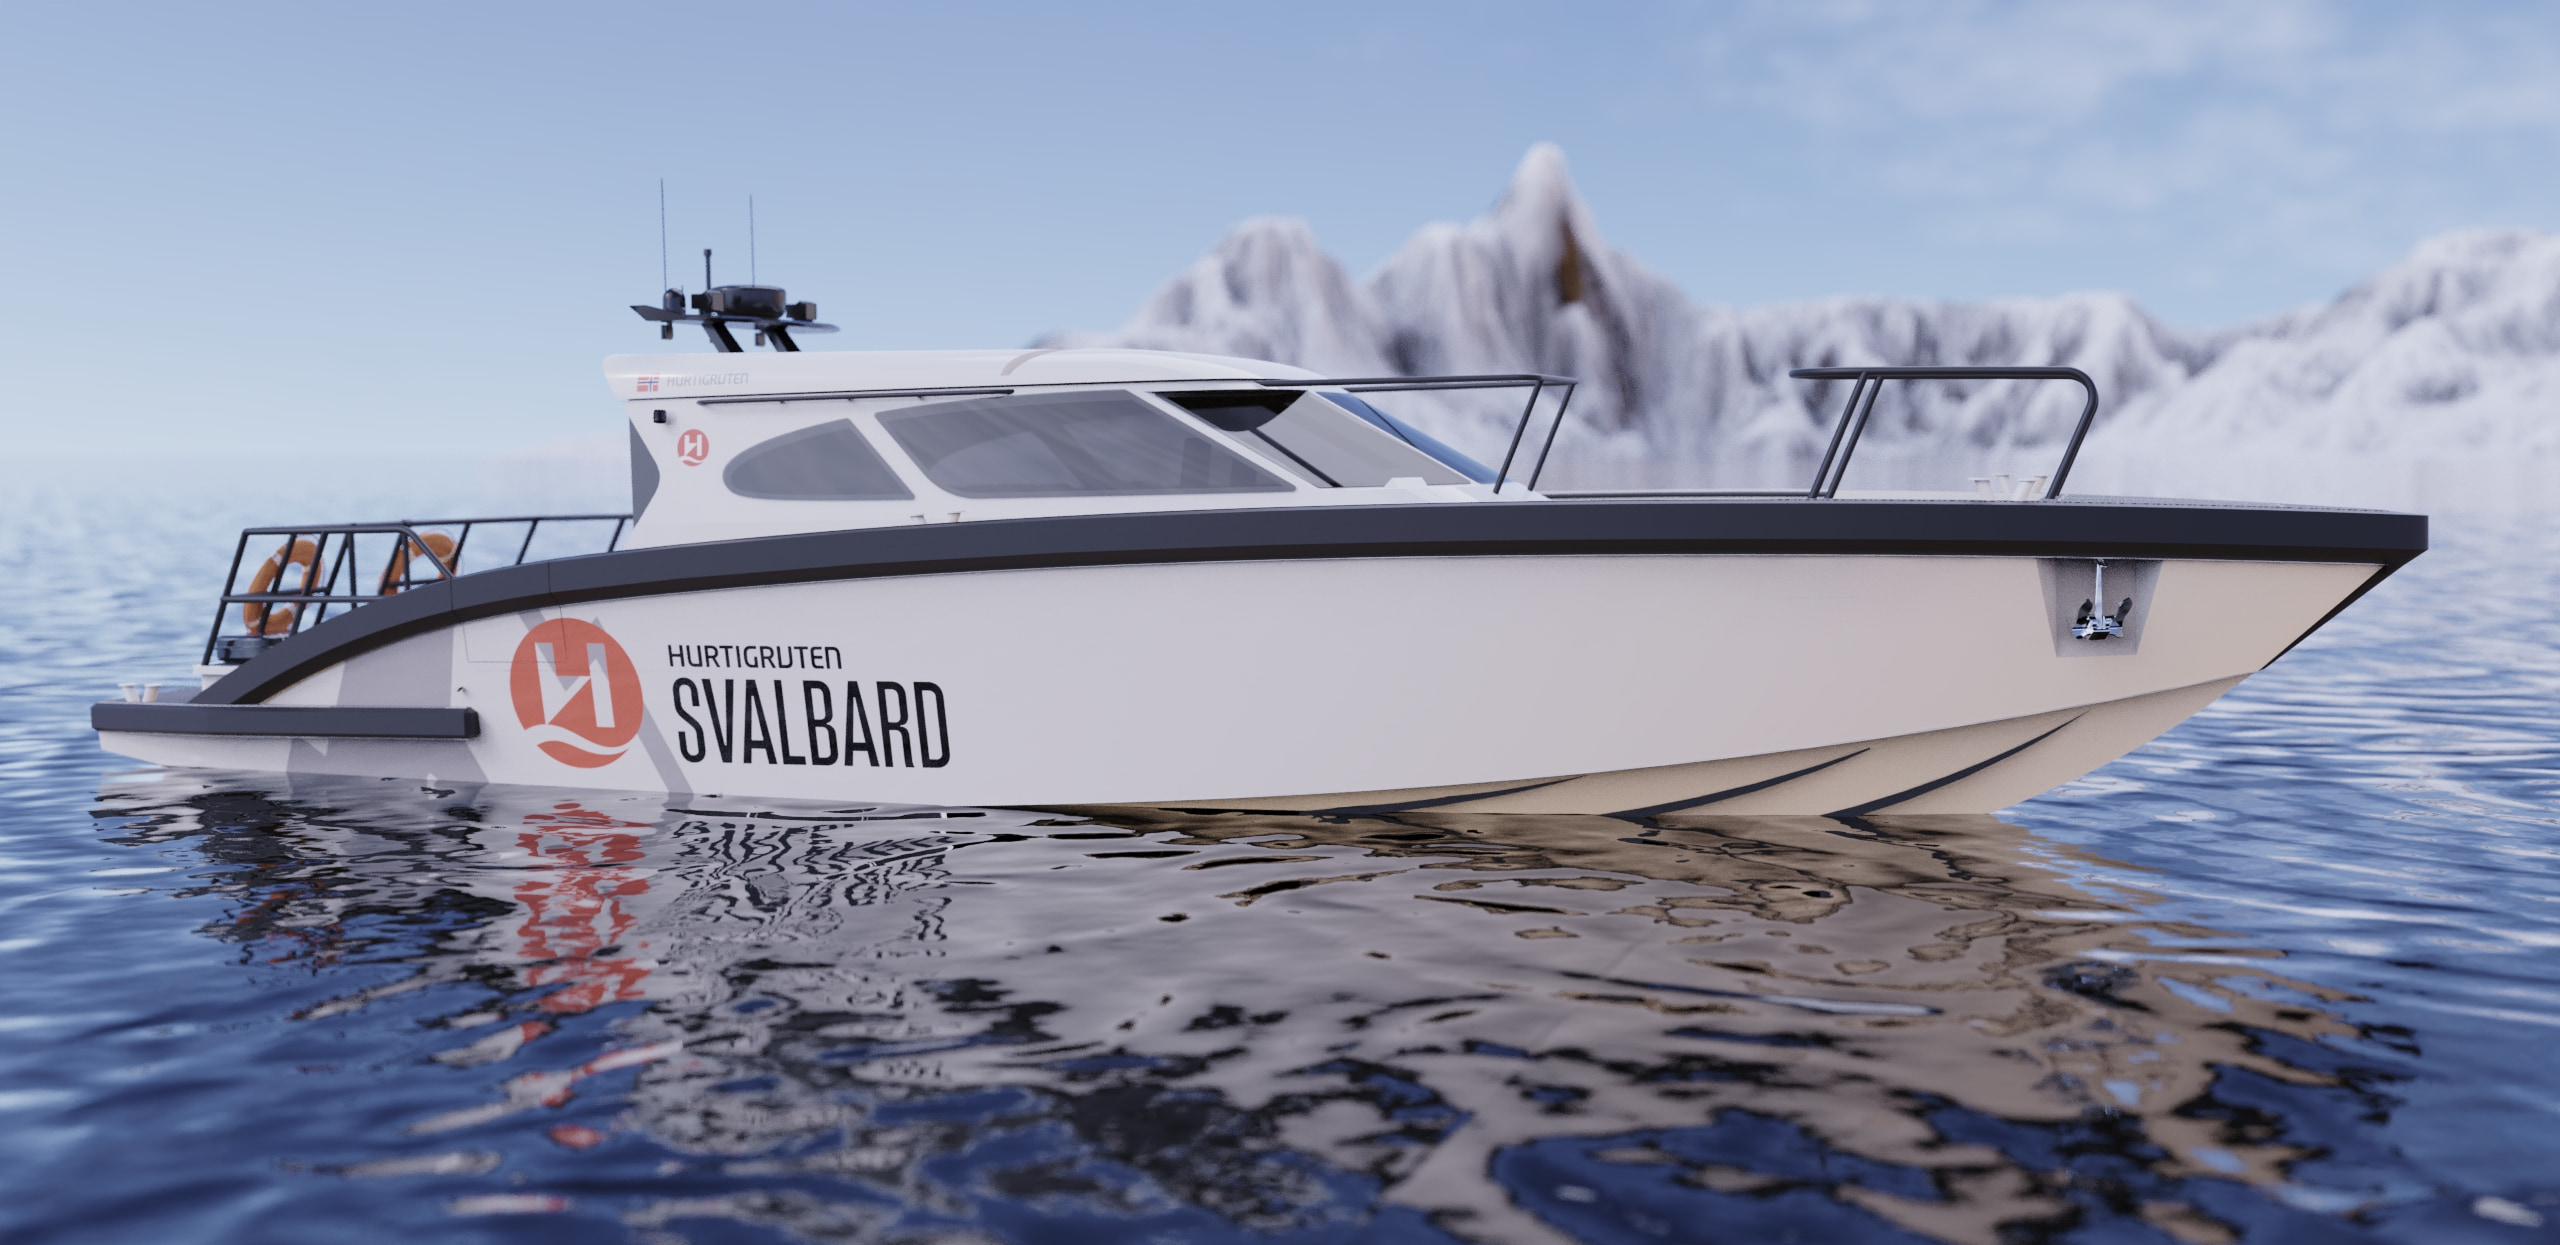 M9 Hurtigrutten rendered boat model